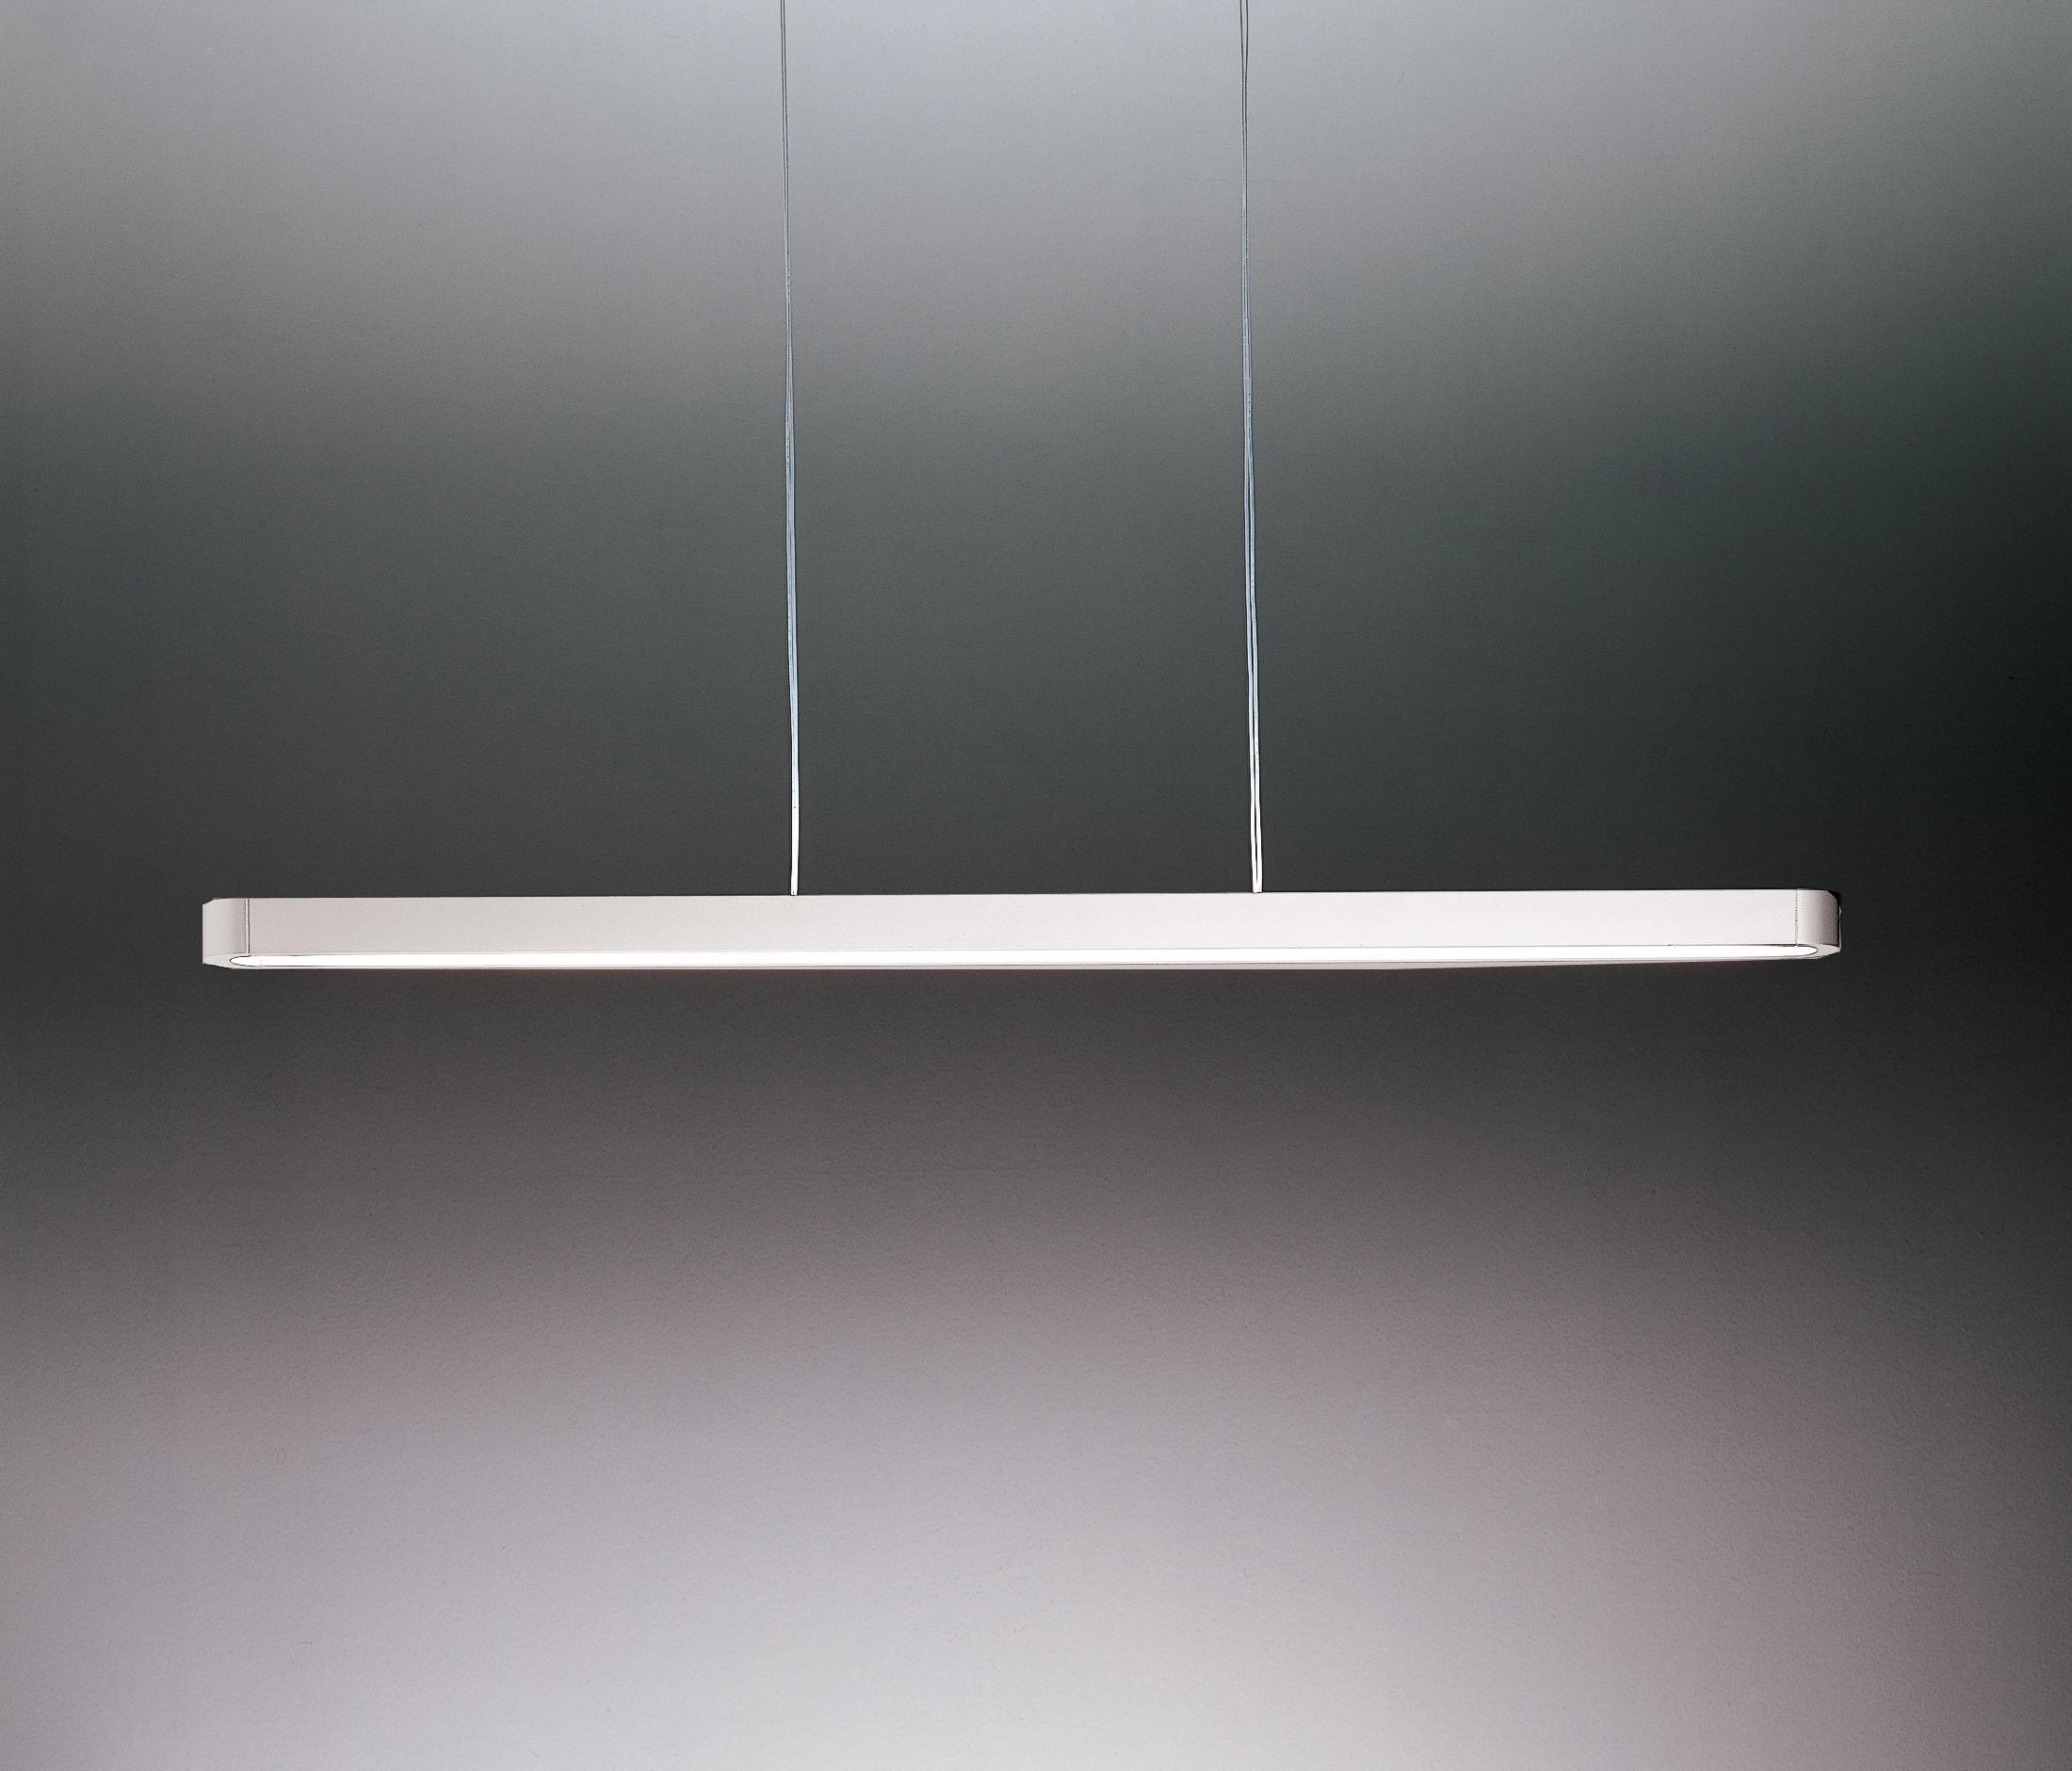 talo luminaires suspension clairage g n ral de artemide architonic. Black Bedroom Furniture Sets. Home Design Ideas